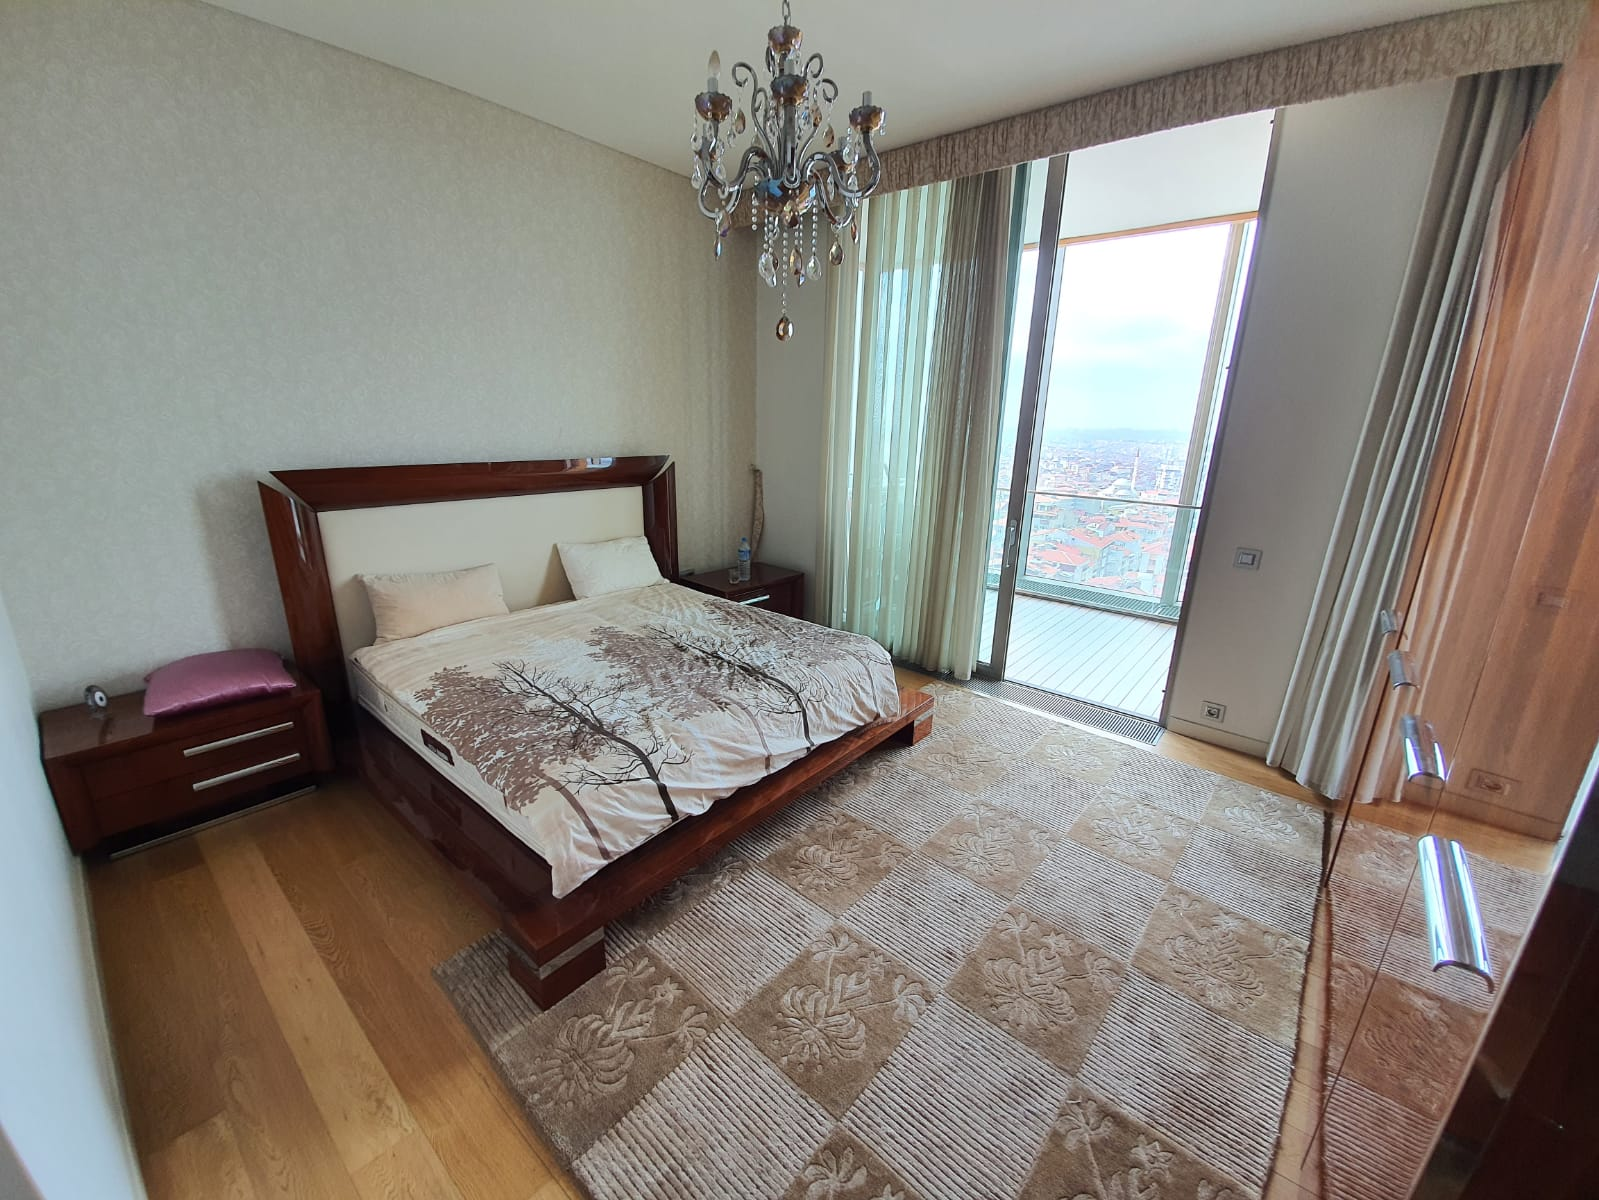 apartments-residence-sapphire-tower-11th-floor-014.jpg